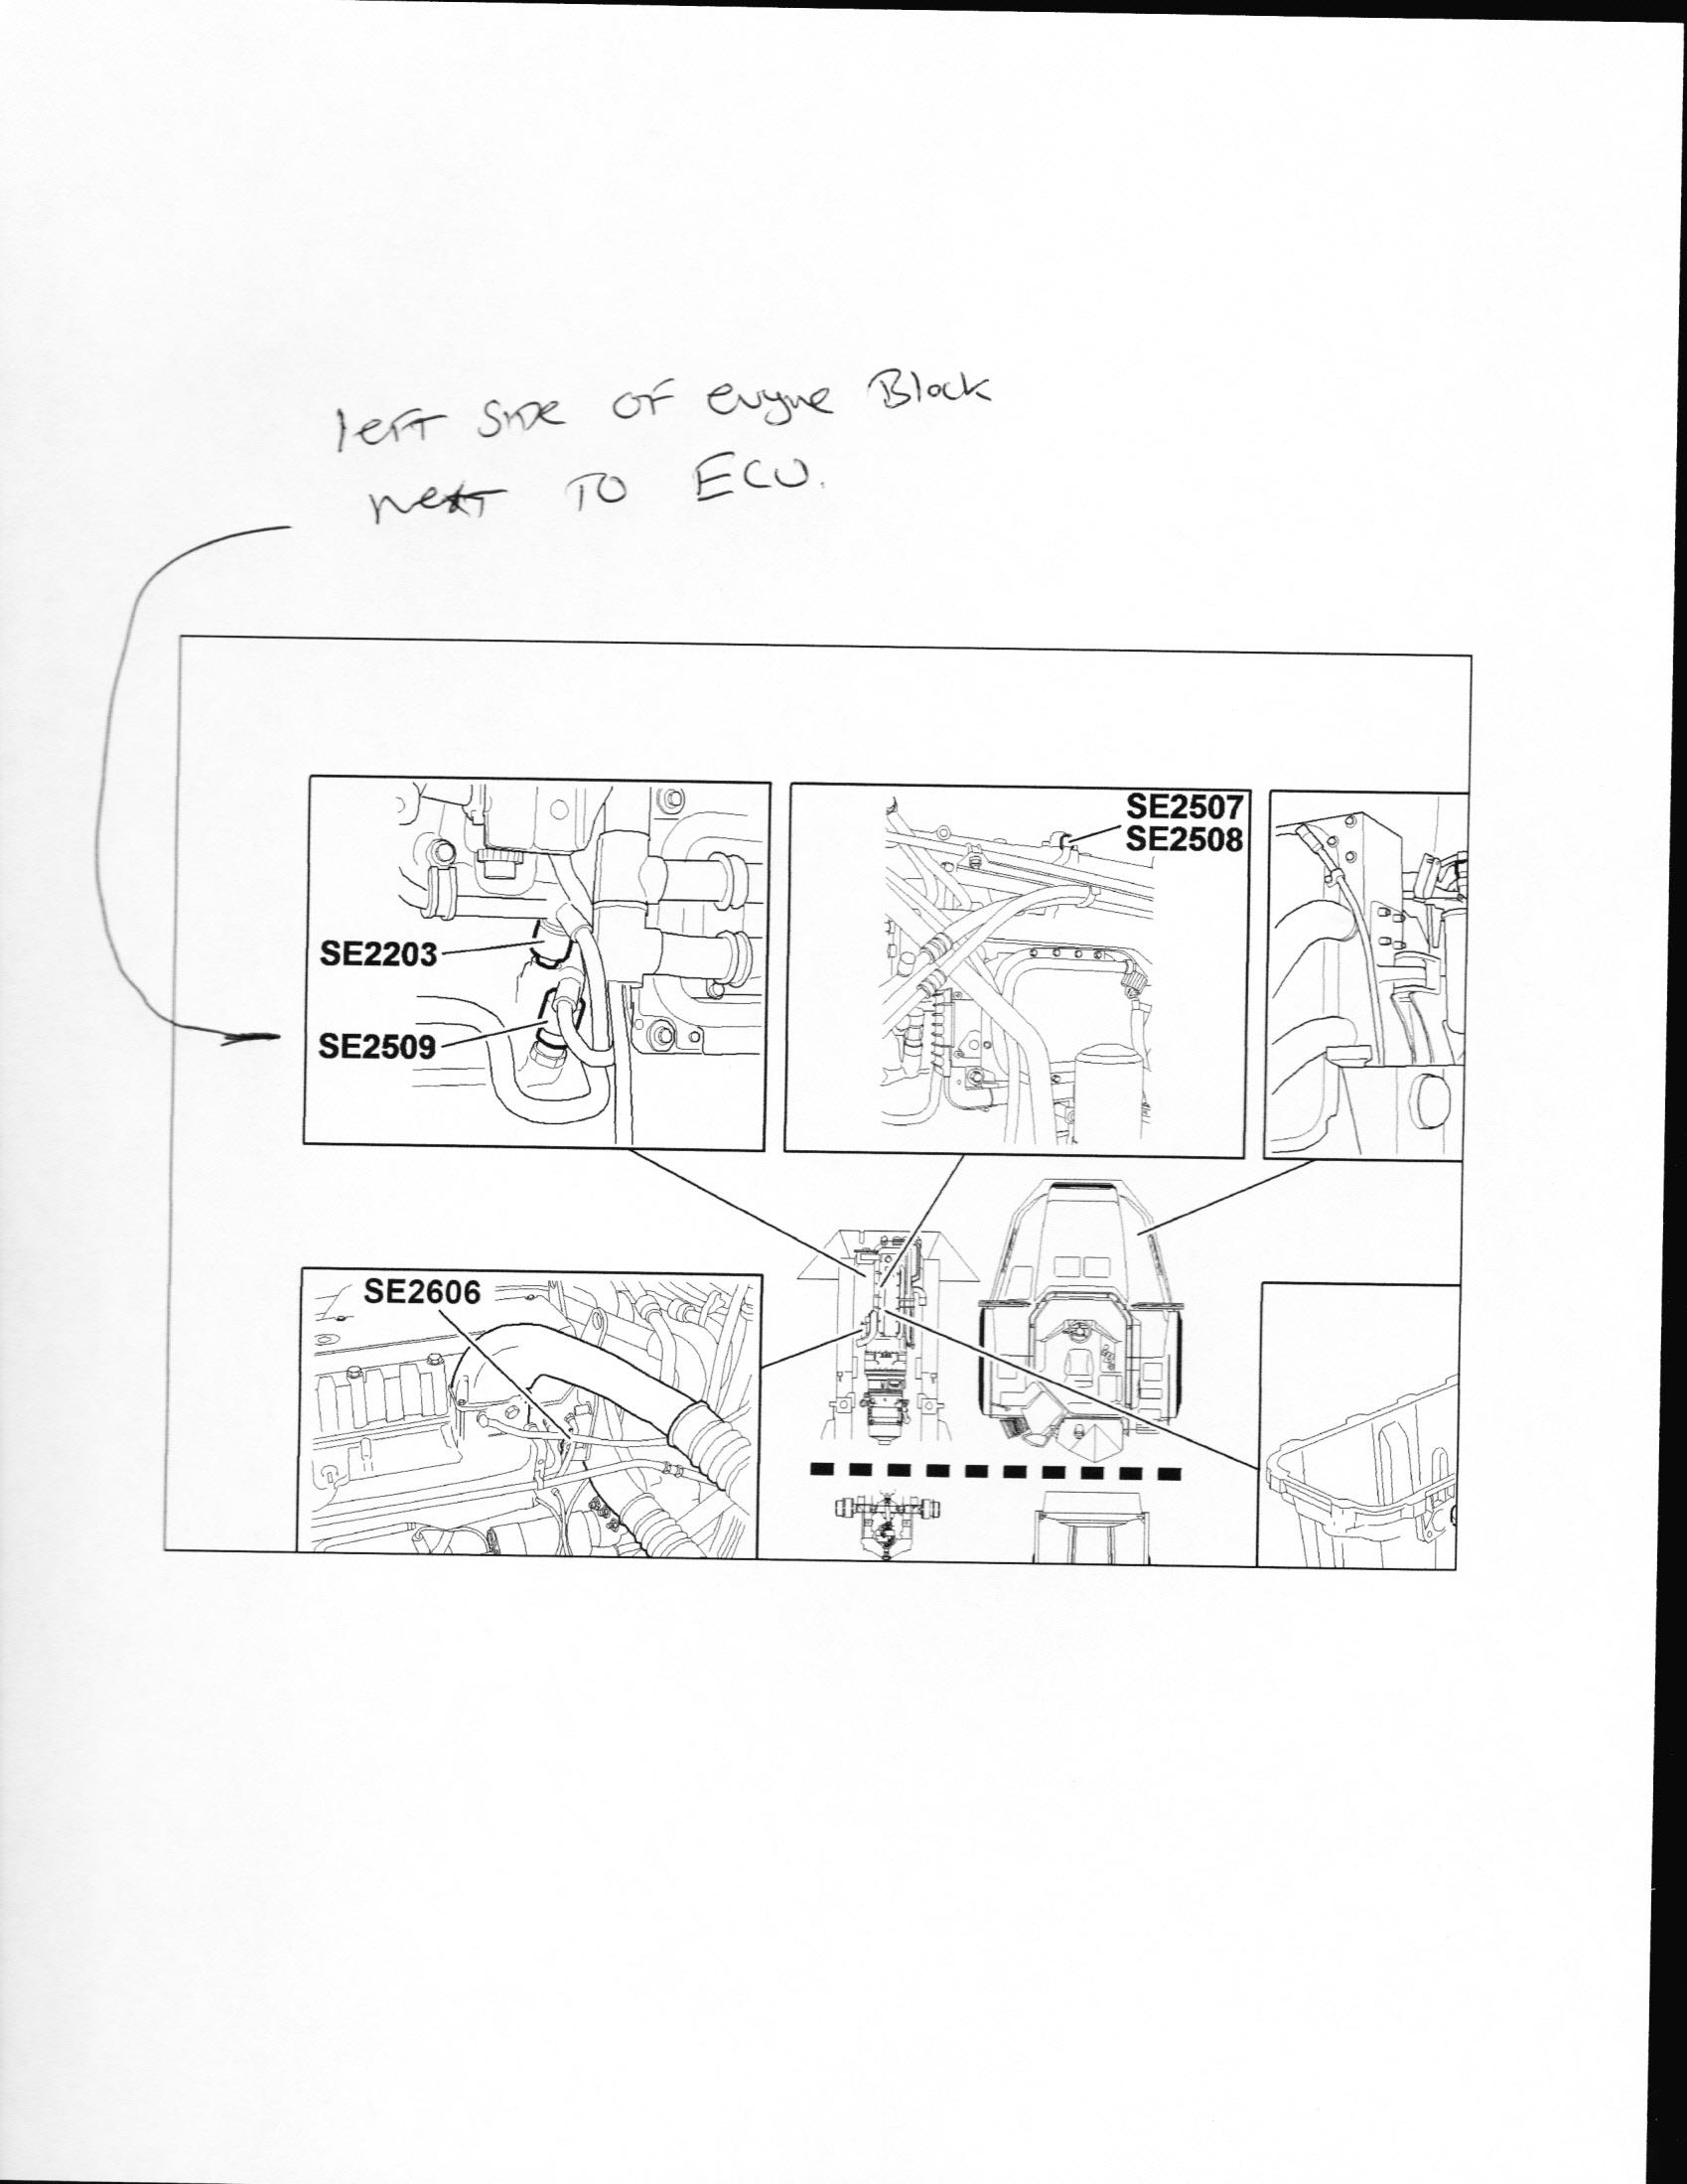 Volvo Vecu Wiring Diagram Trusted Diagrams 1996 Semi Truck Schematic